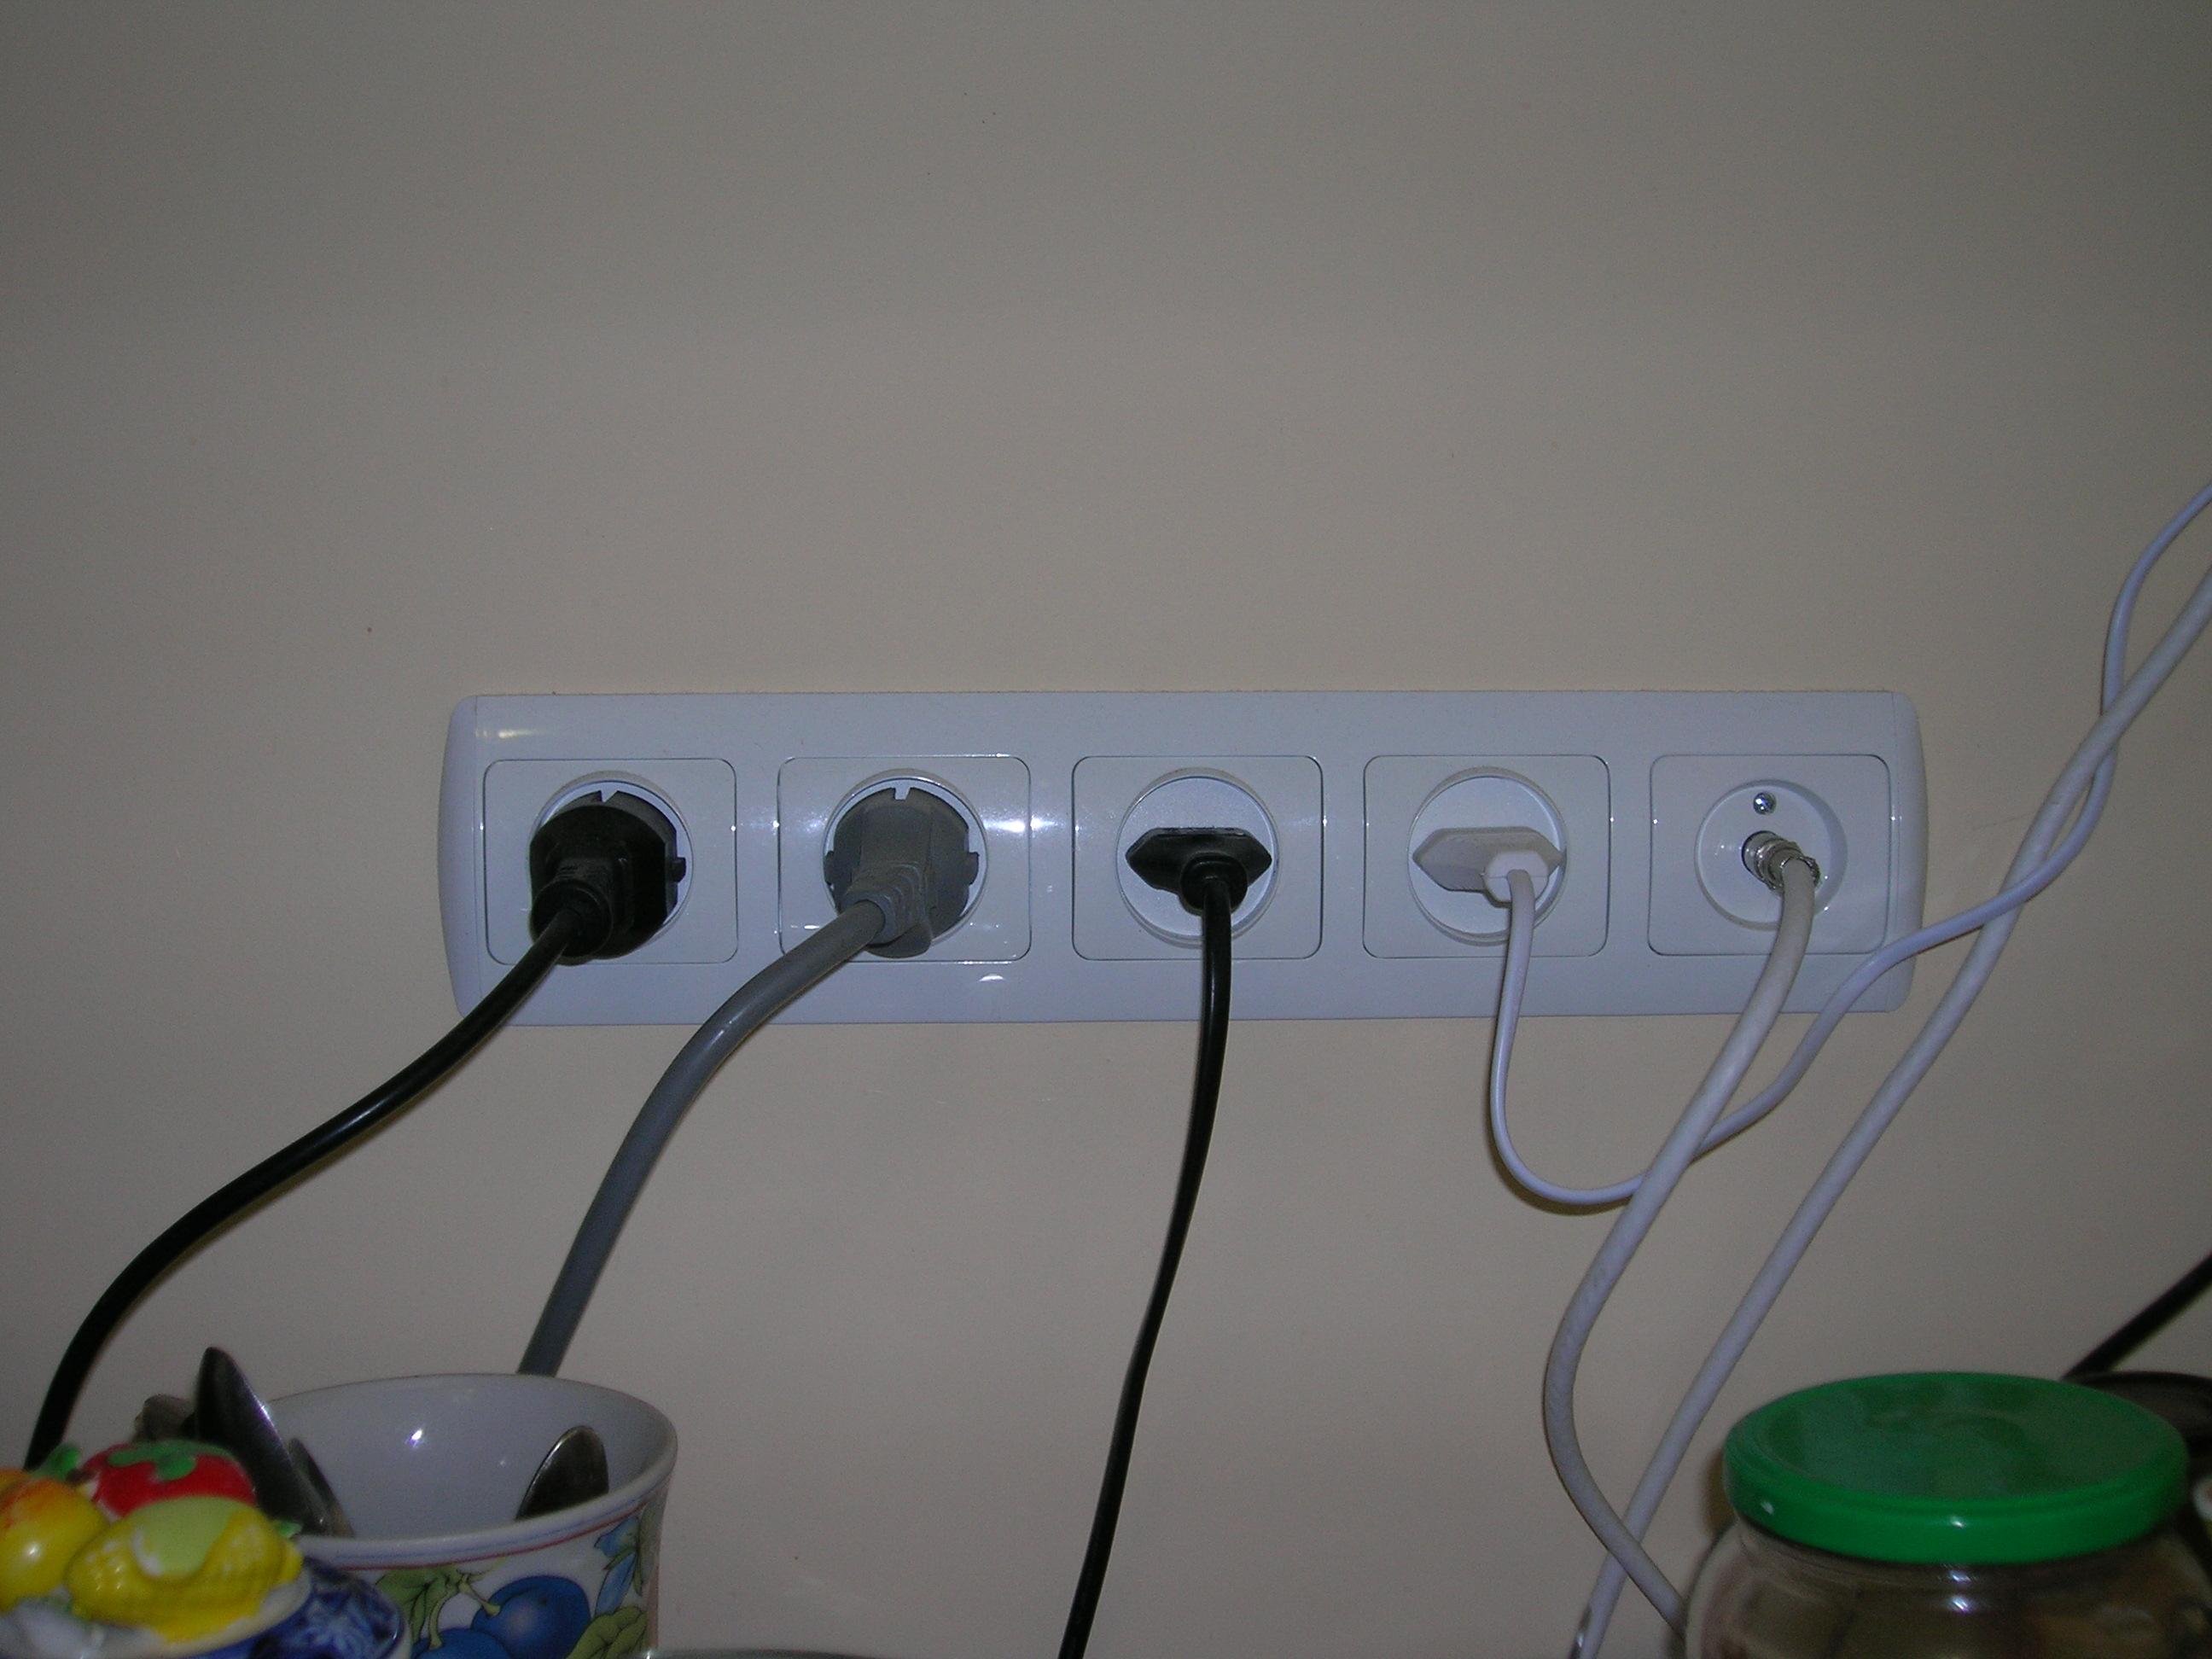 Фото Установка и подключение розеток и выключателей